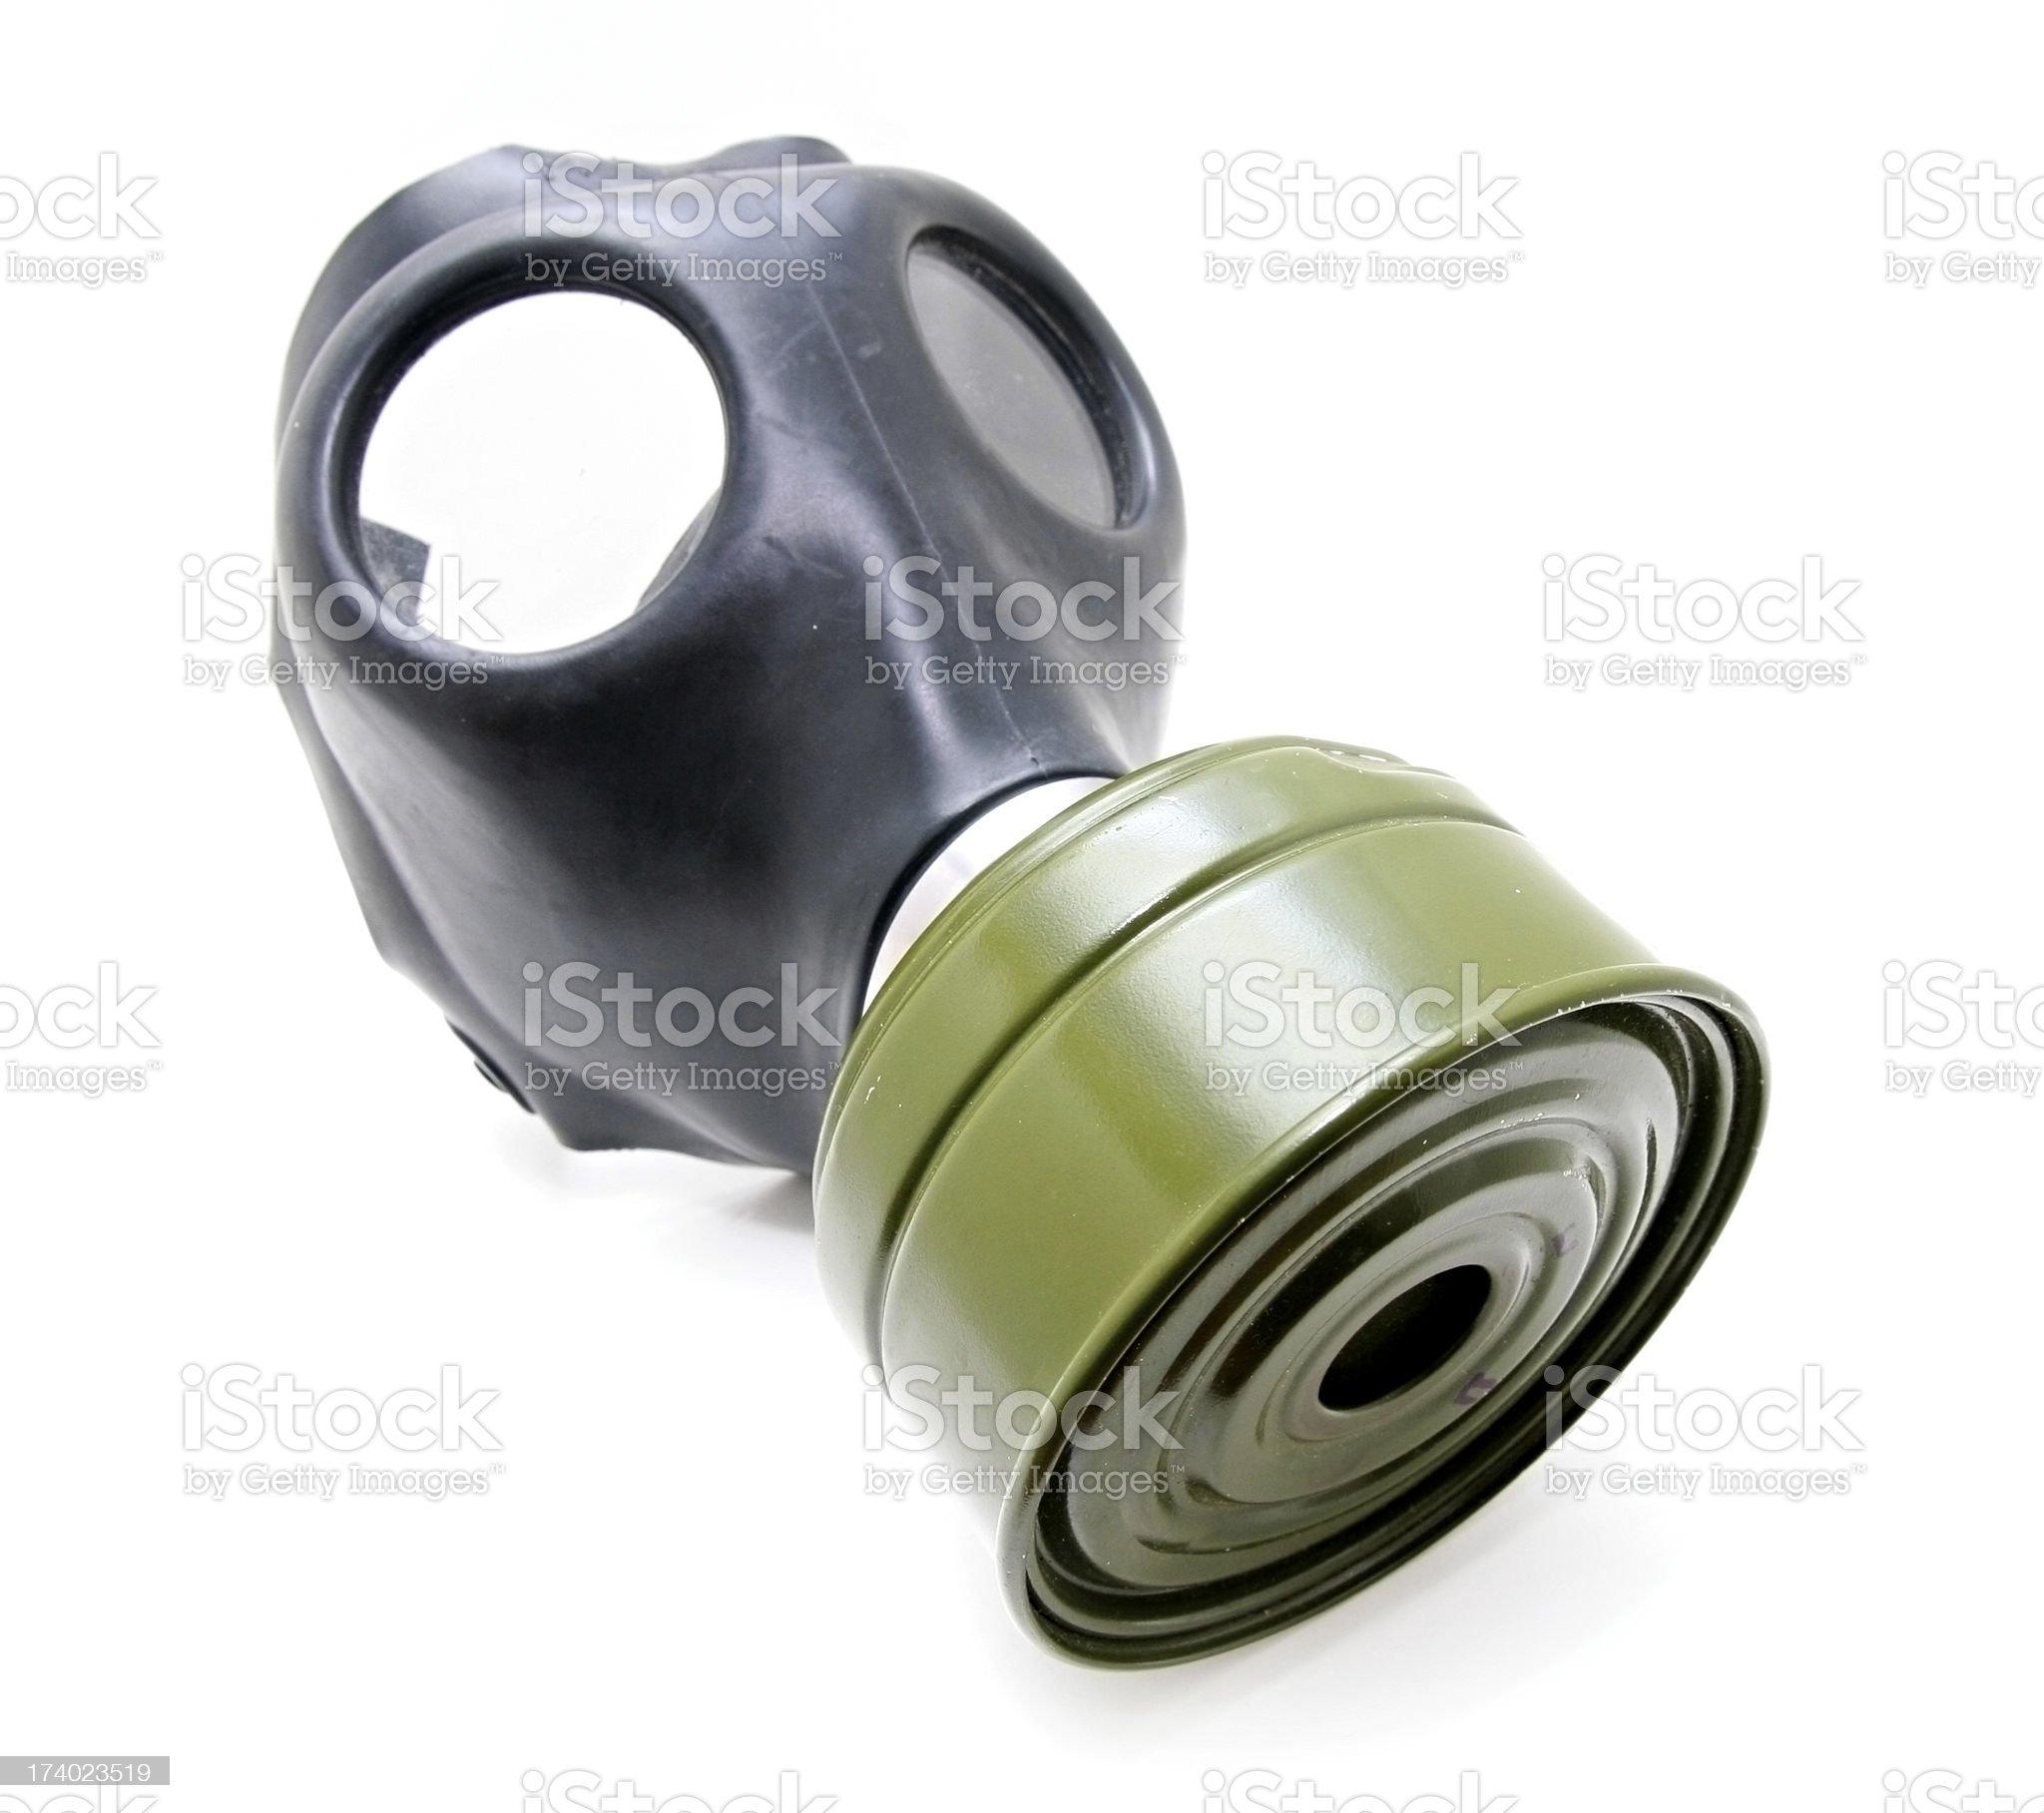 Vintage Gas Mask Isolated on White Background royalty-free stock photo